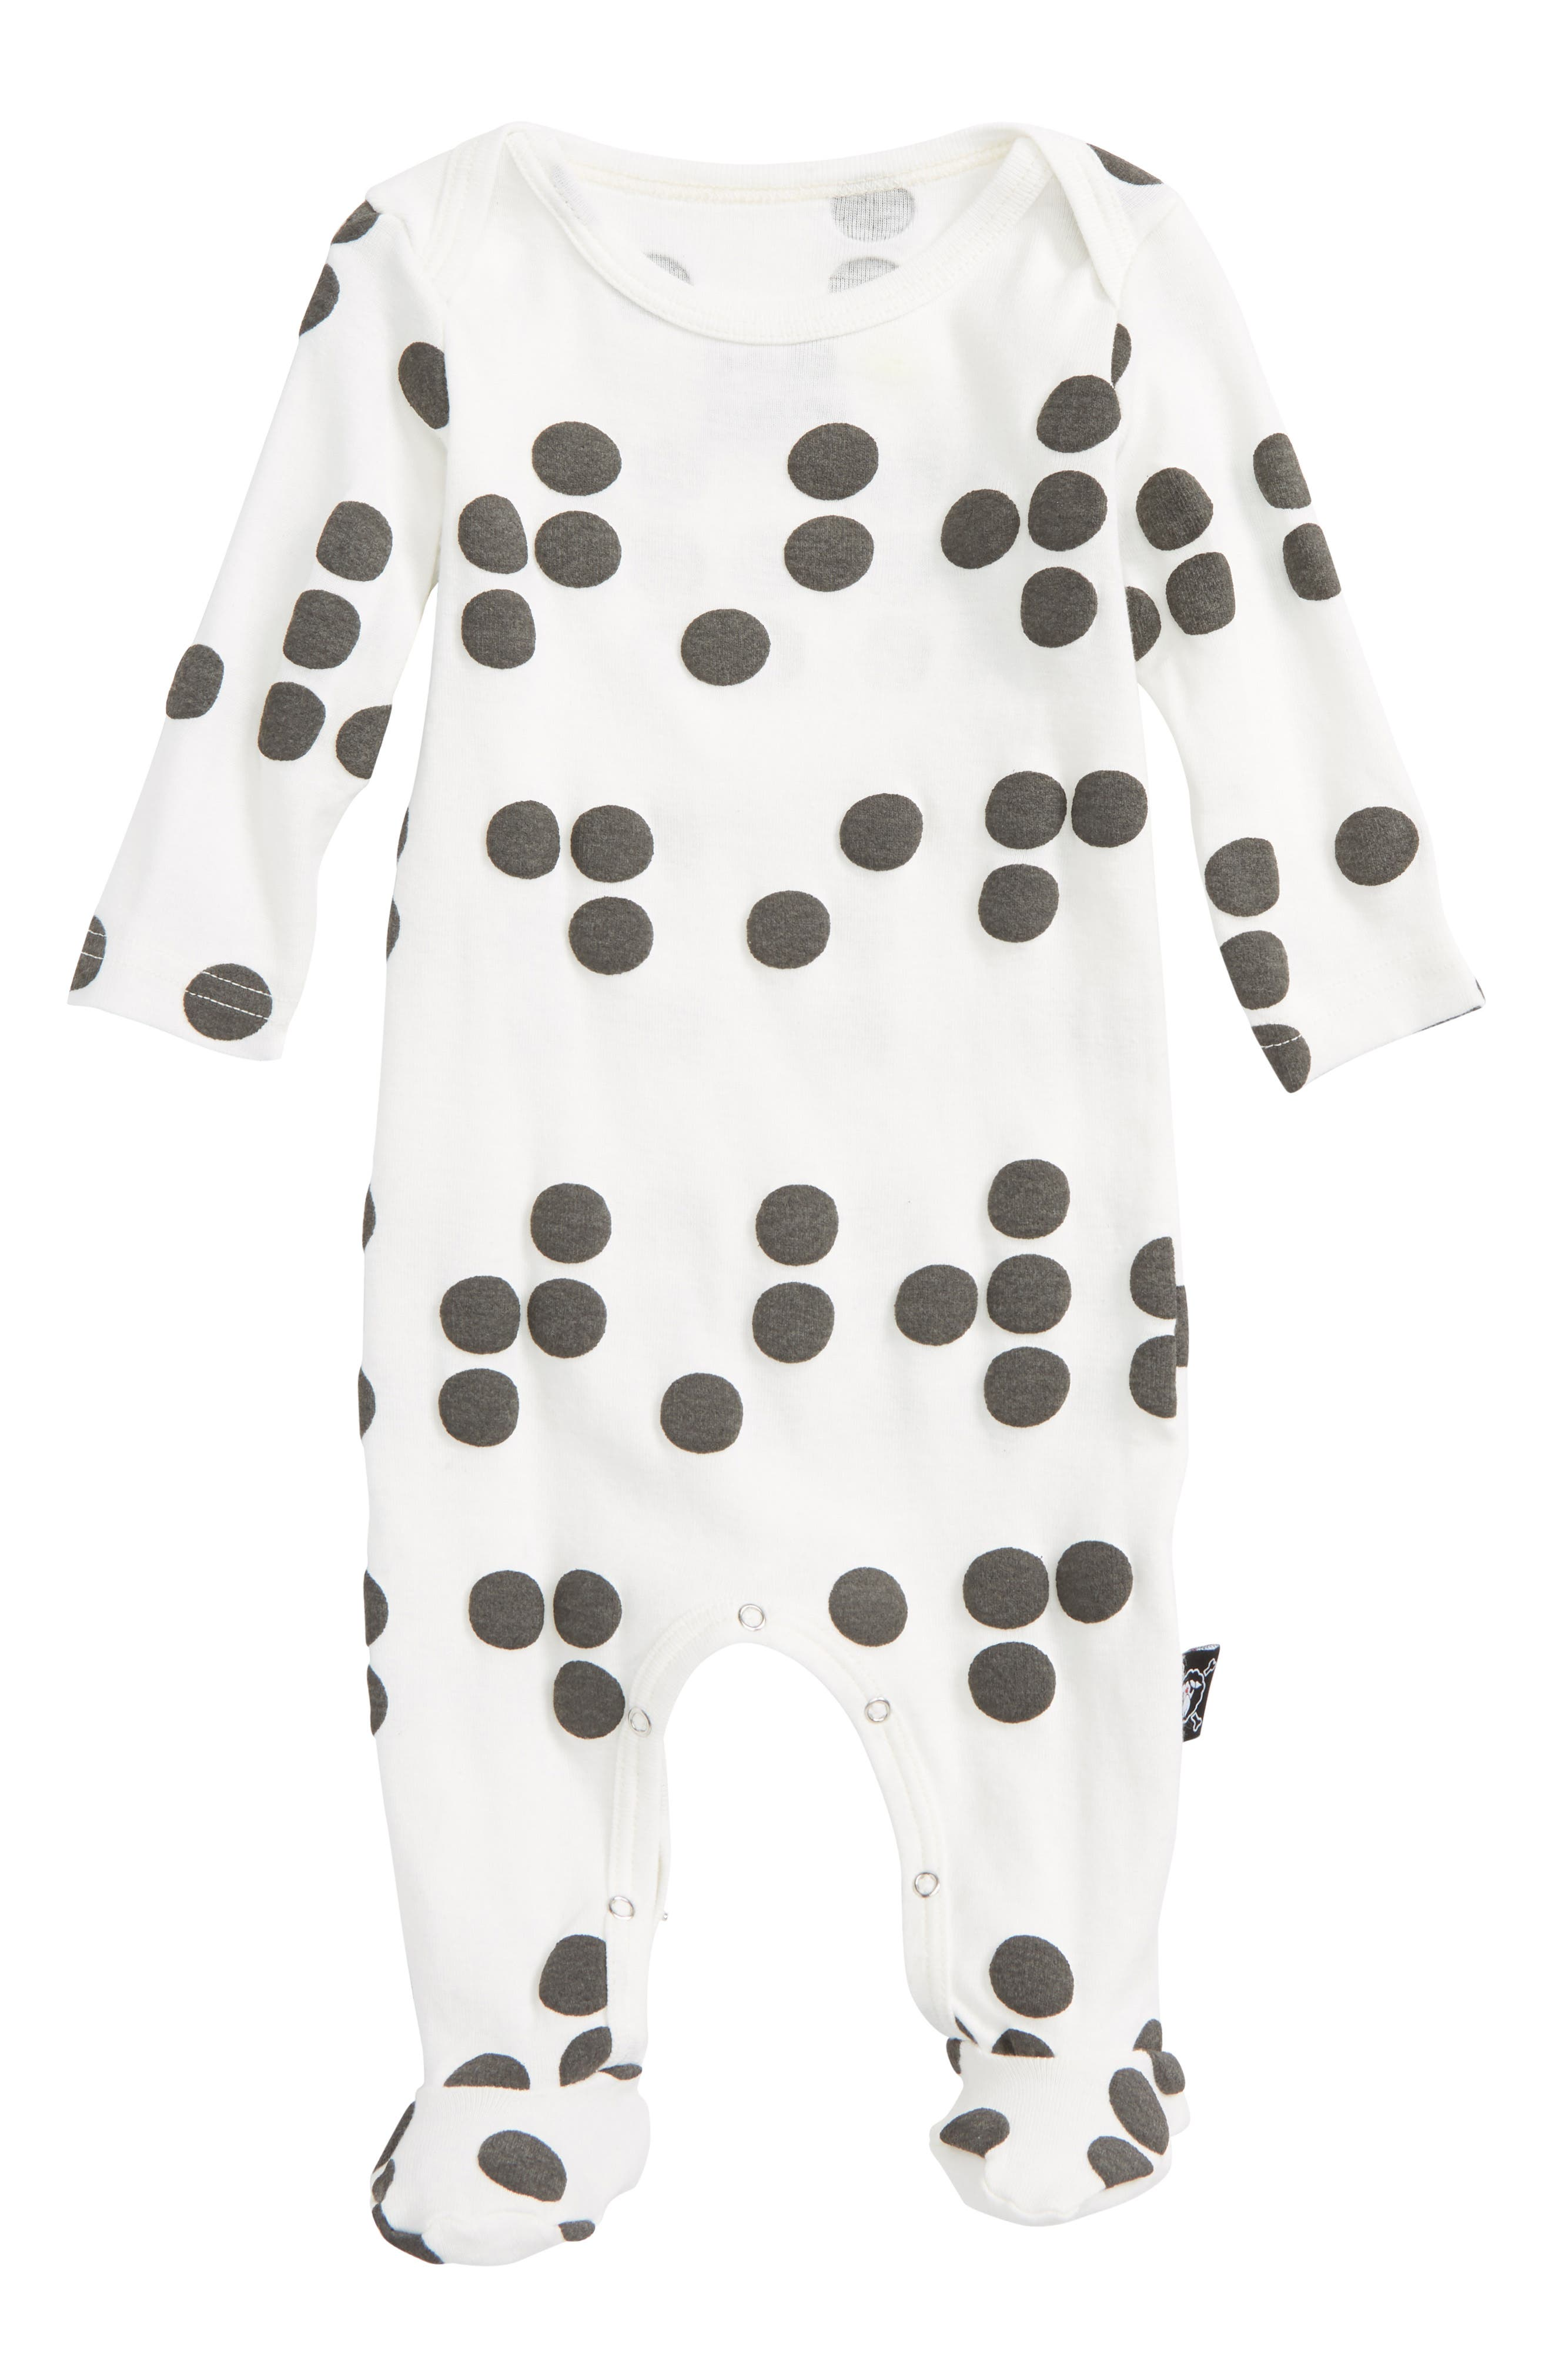 Nununu Braille Footie (Baby)